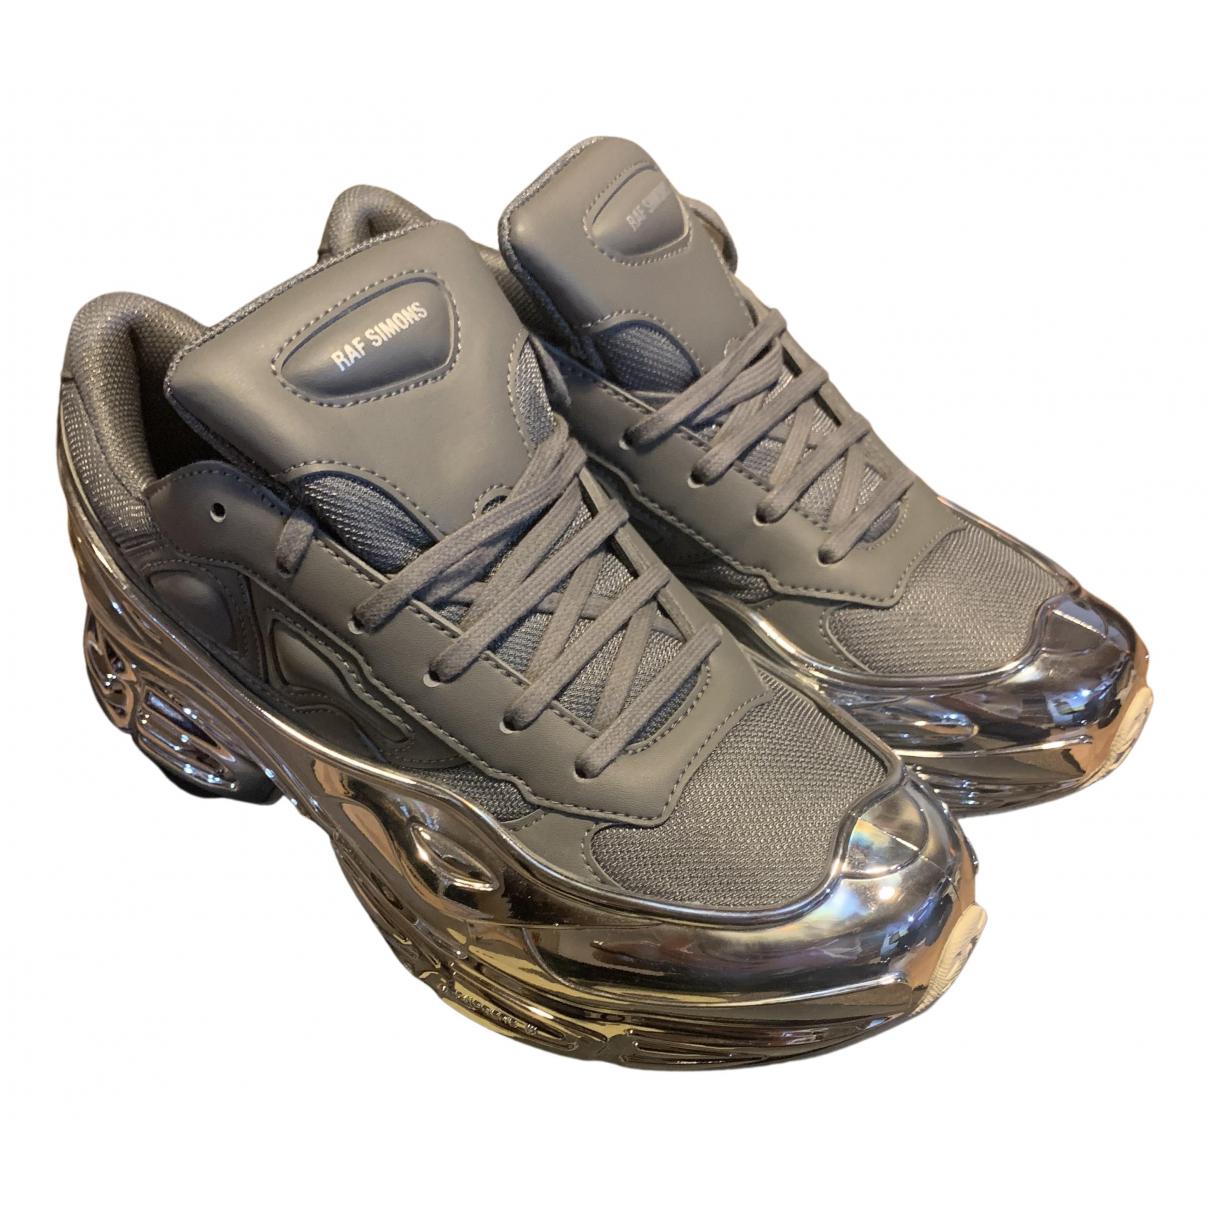 Adidas x Raf Simons RS Ozweego leather low trainers